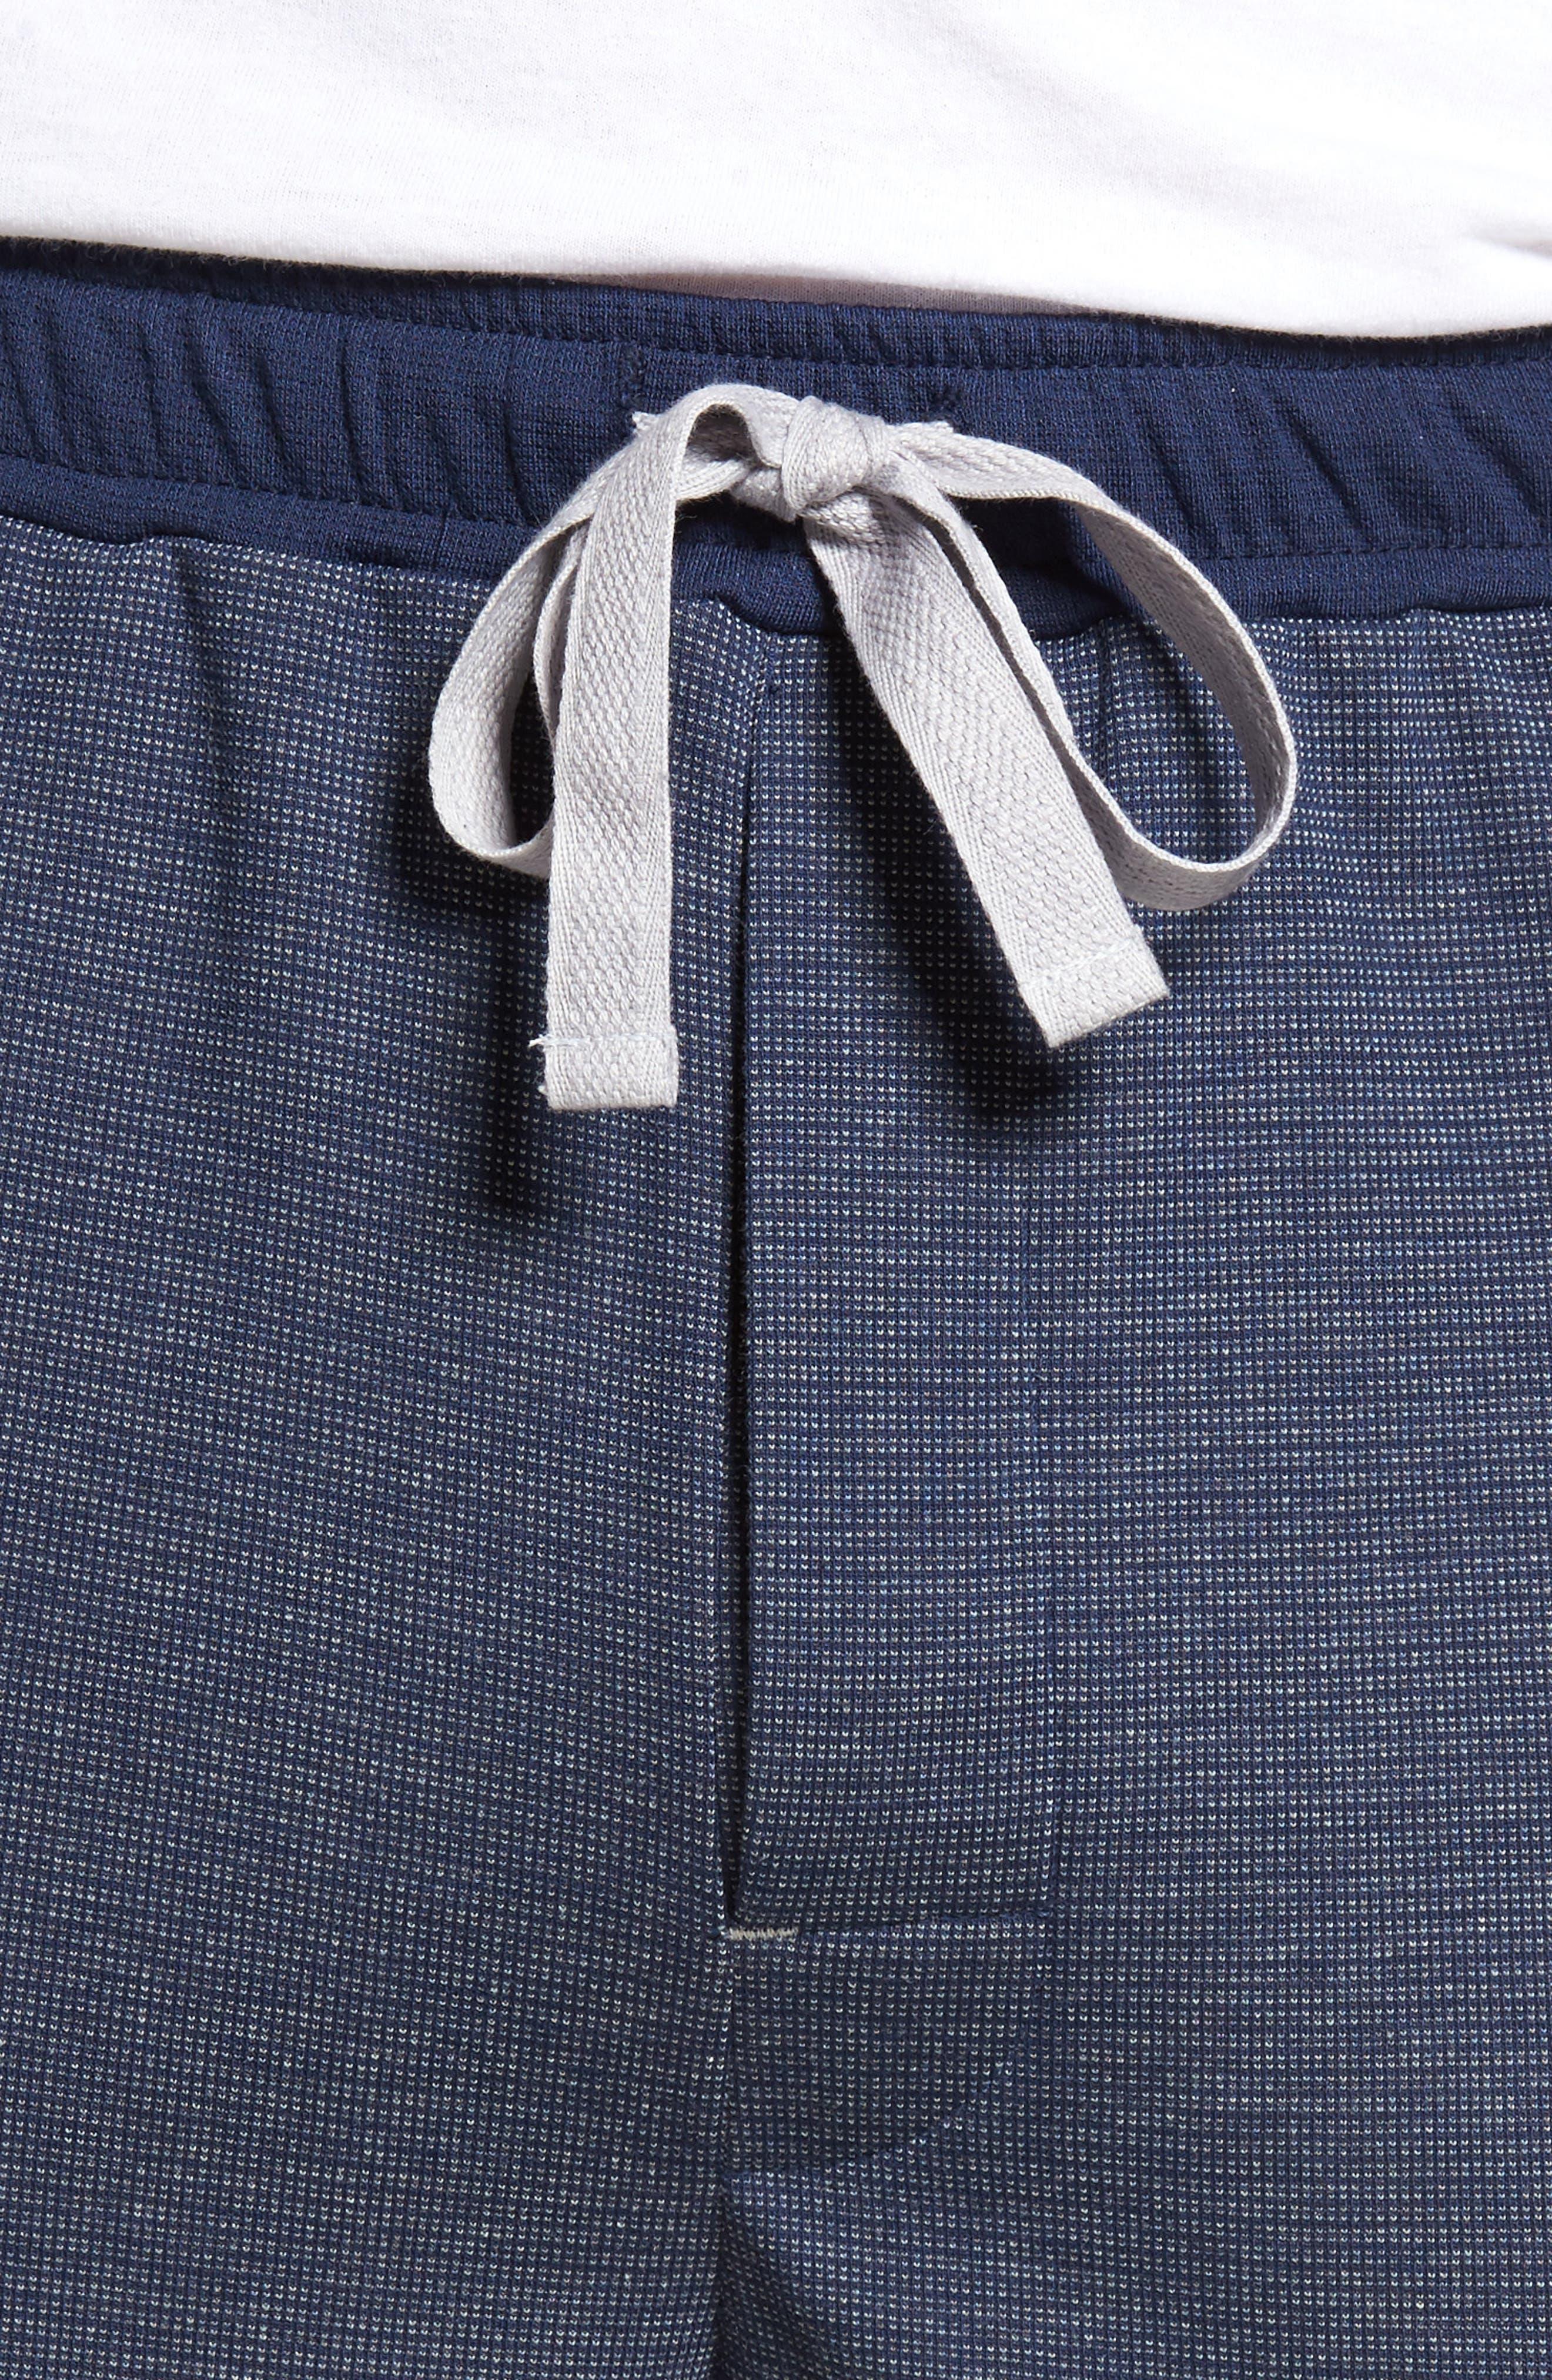 Lodge Layers Lounge Pants,                             Alternate thumbnail 4, color,                             Navy